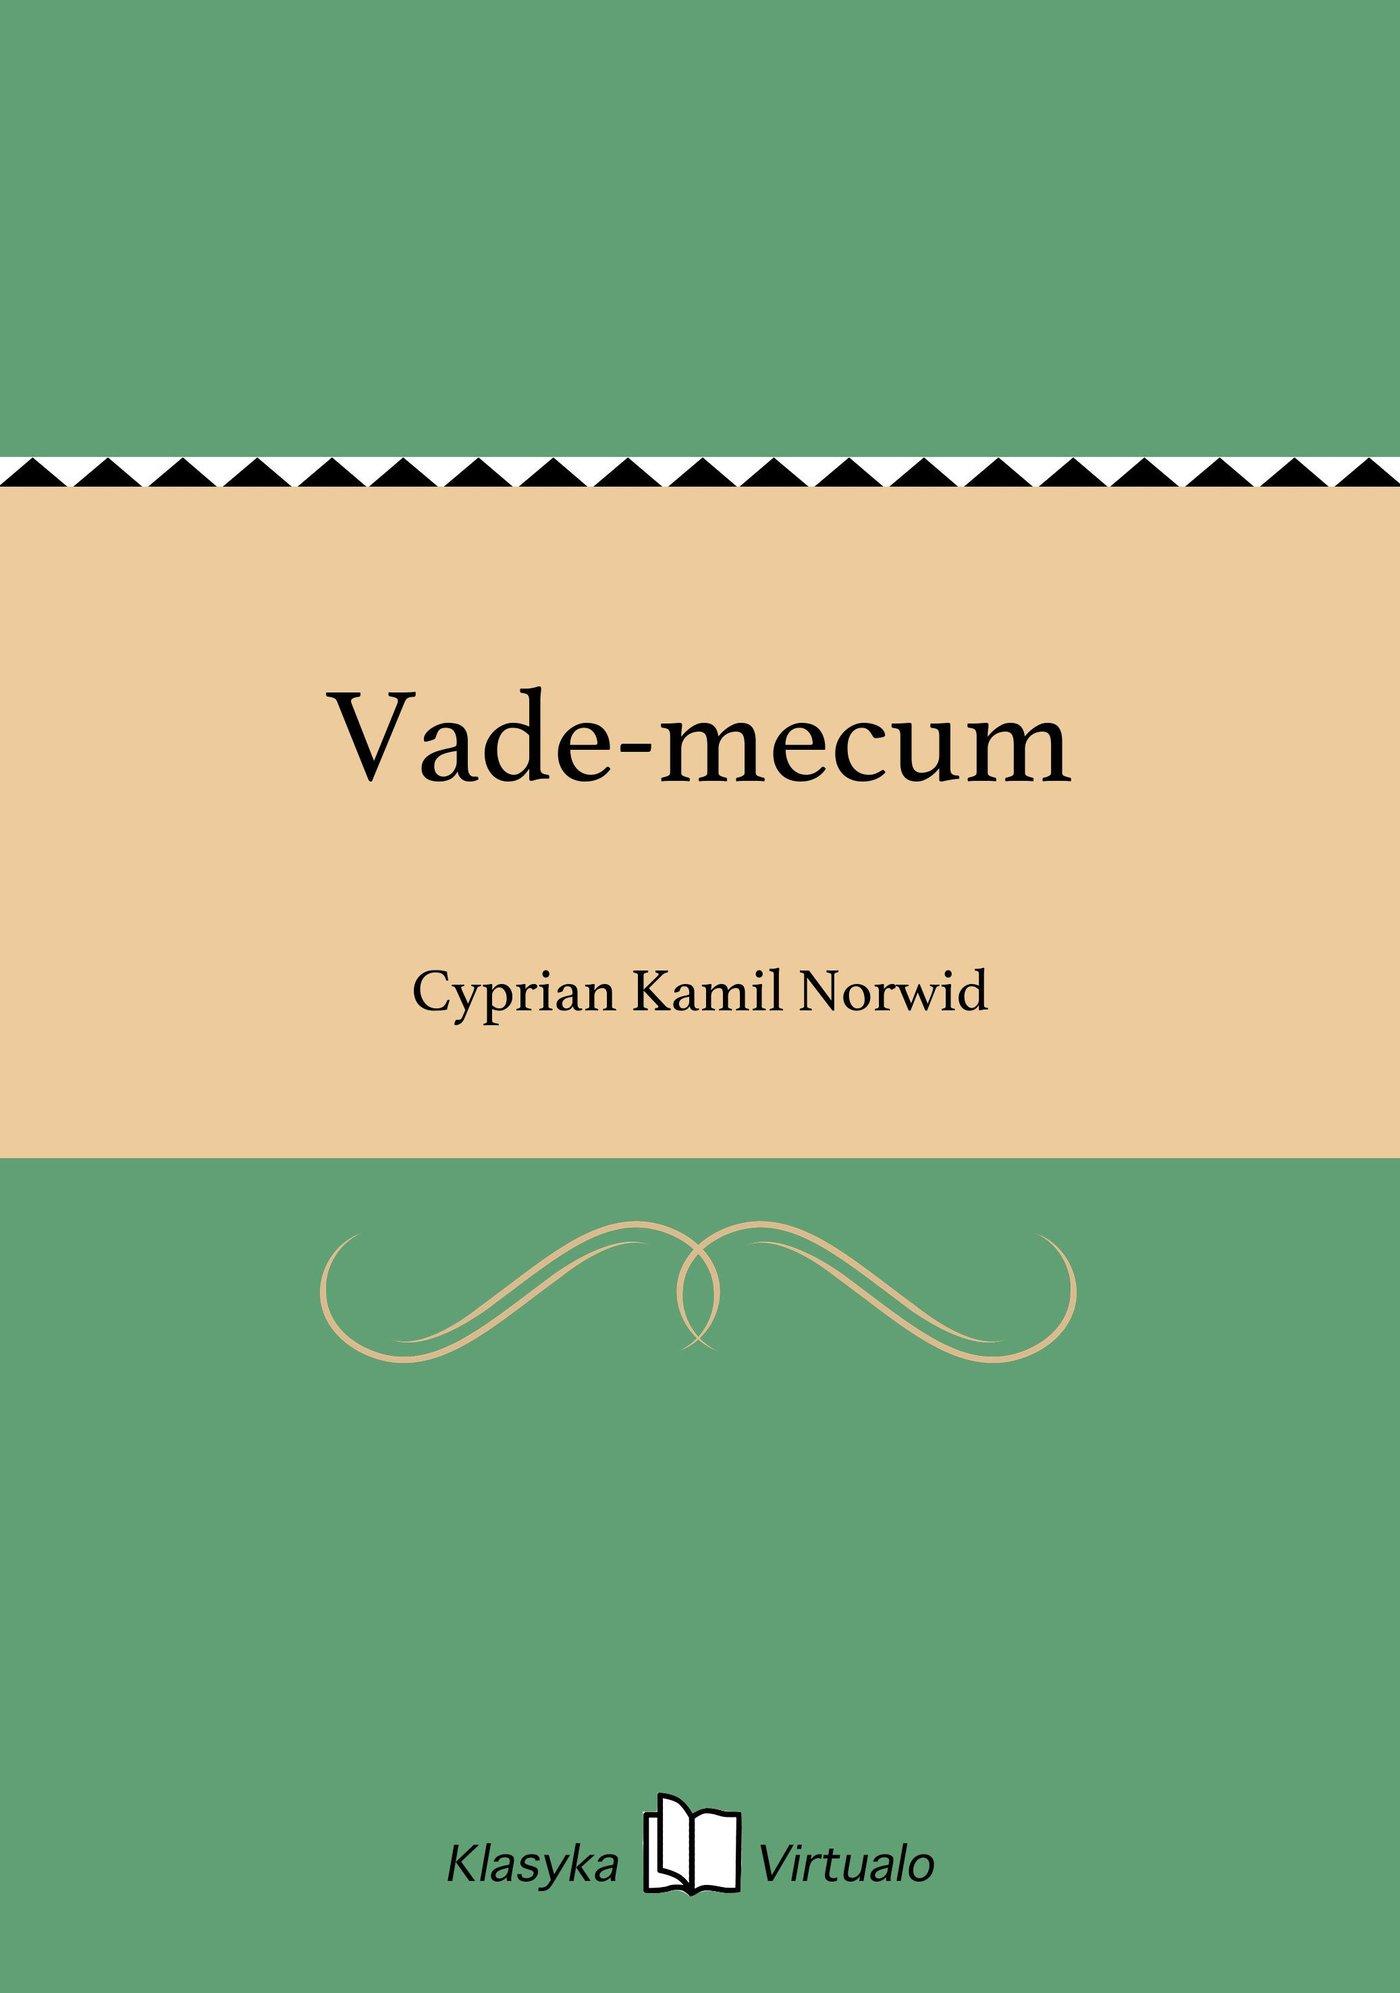 Vade-mecum - Ebook (Książka na Kindle) do pobrania w formacie MOBI